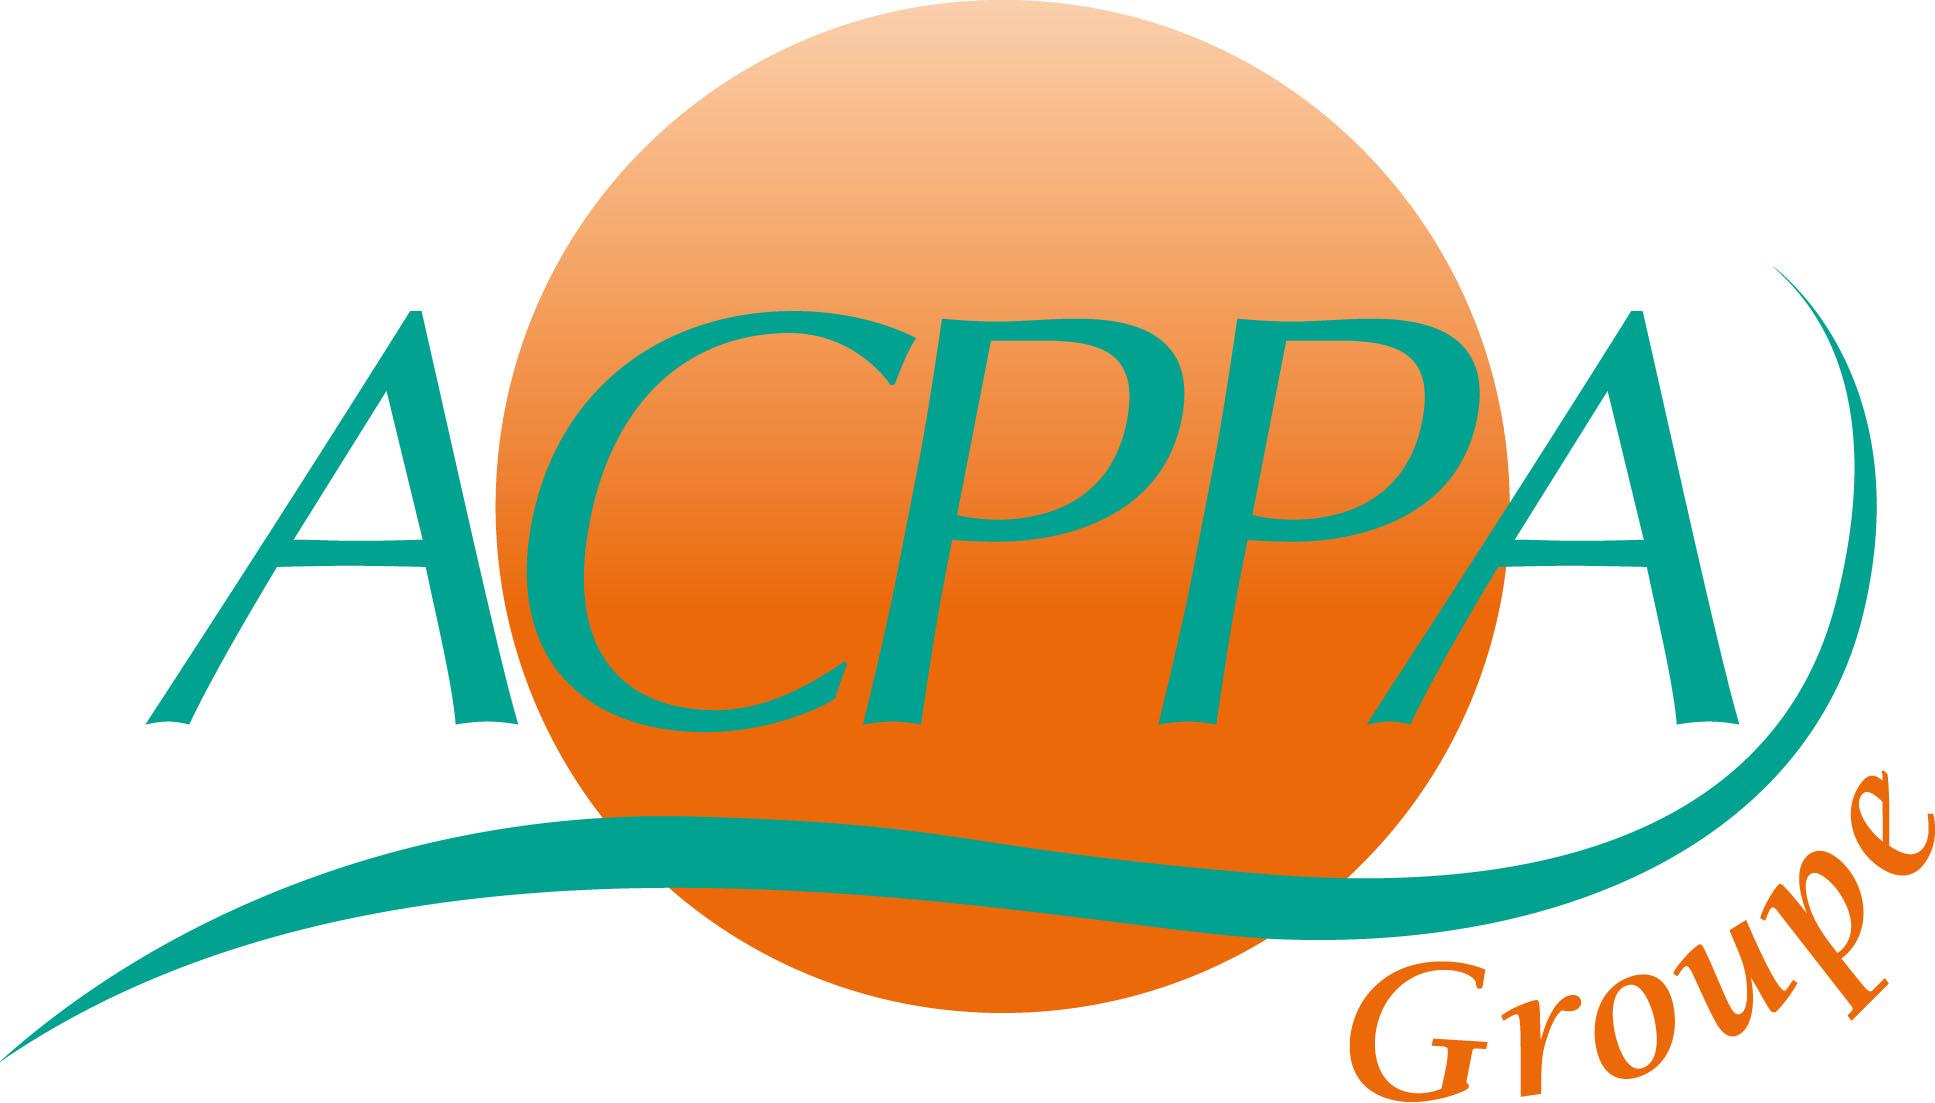 GROUPE ACPPA